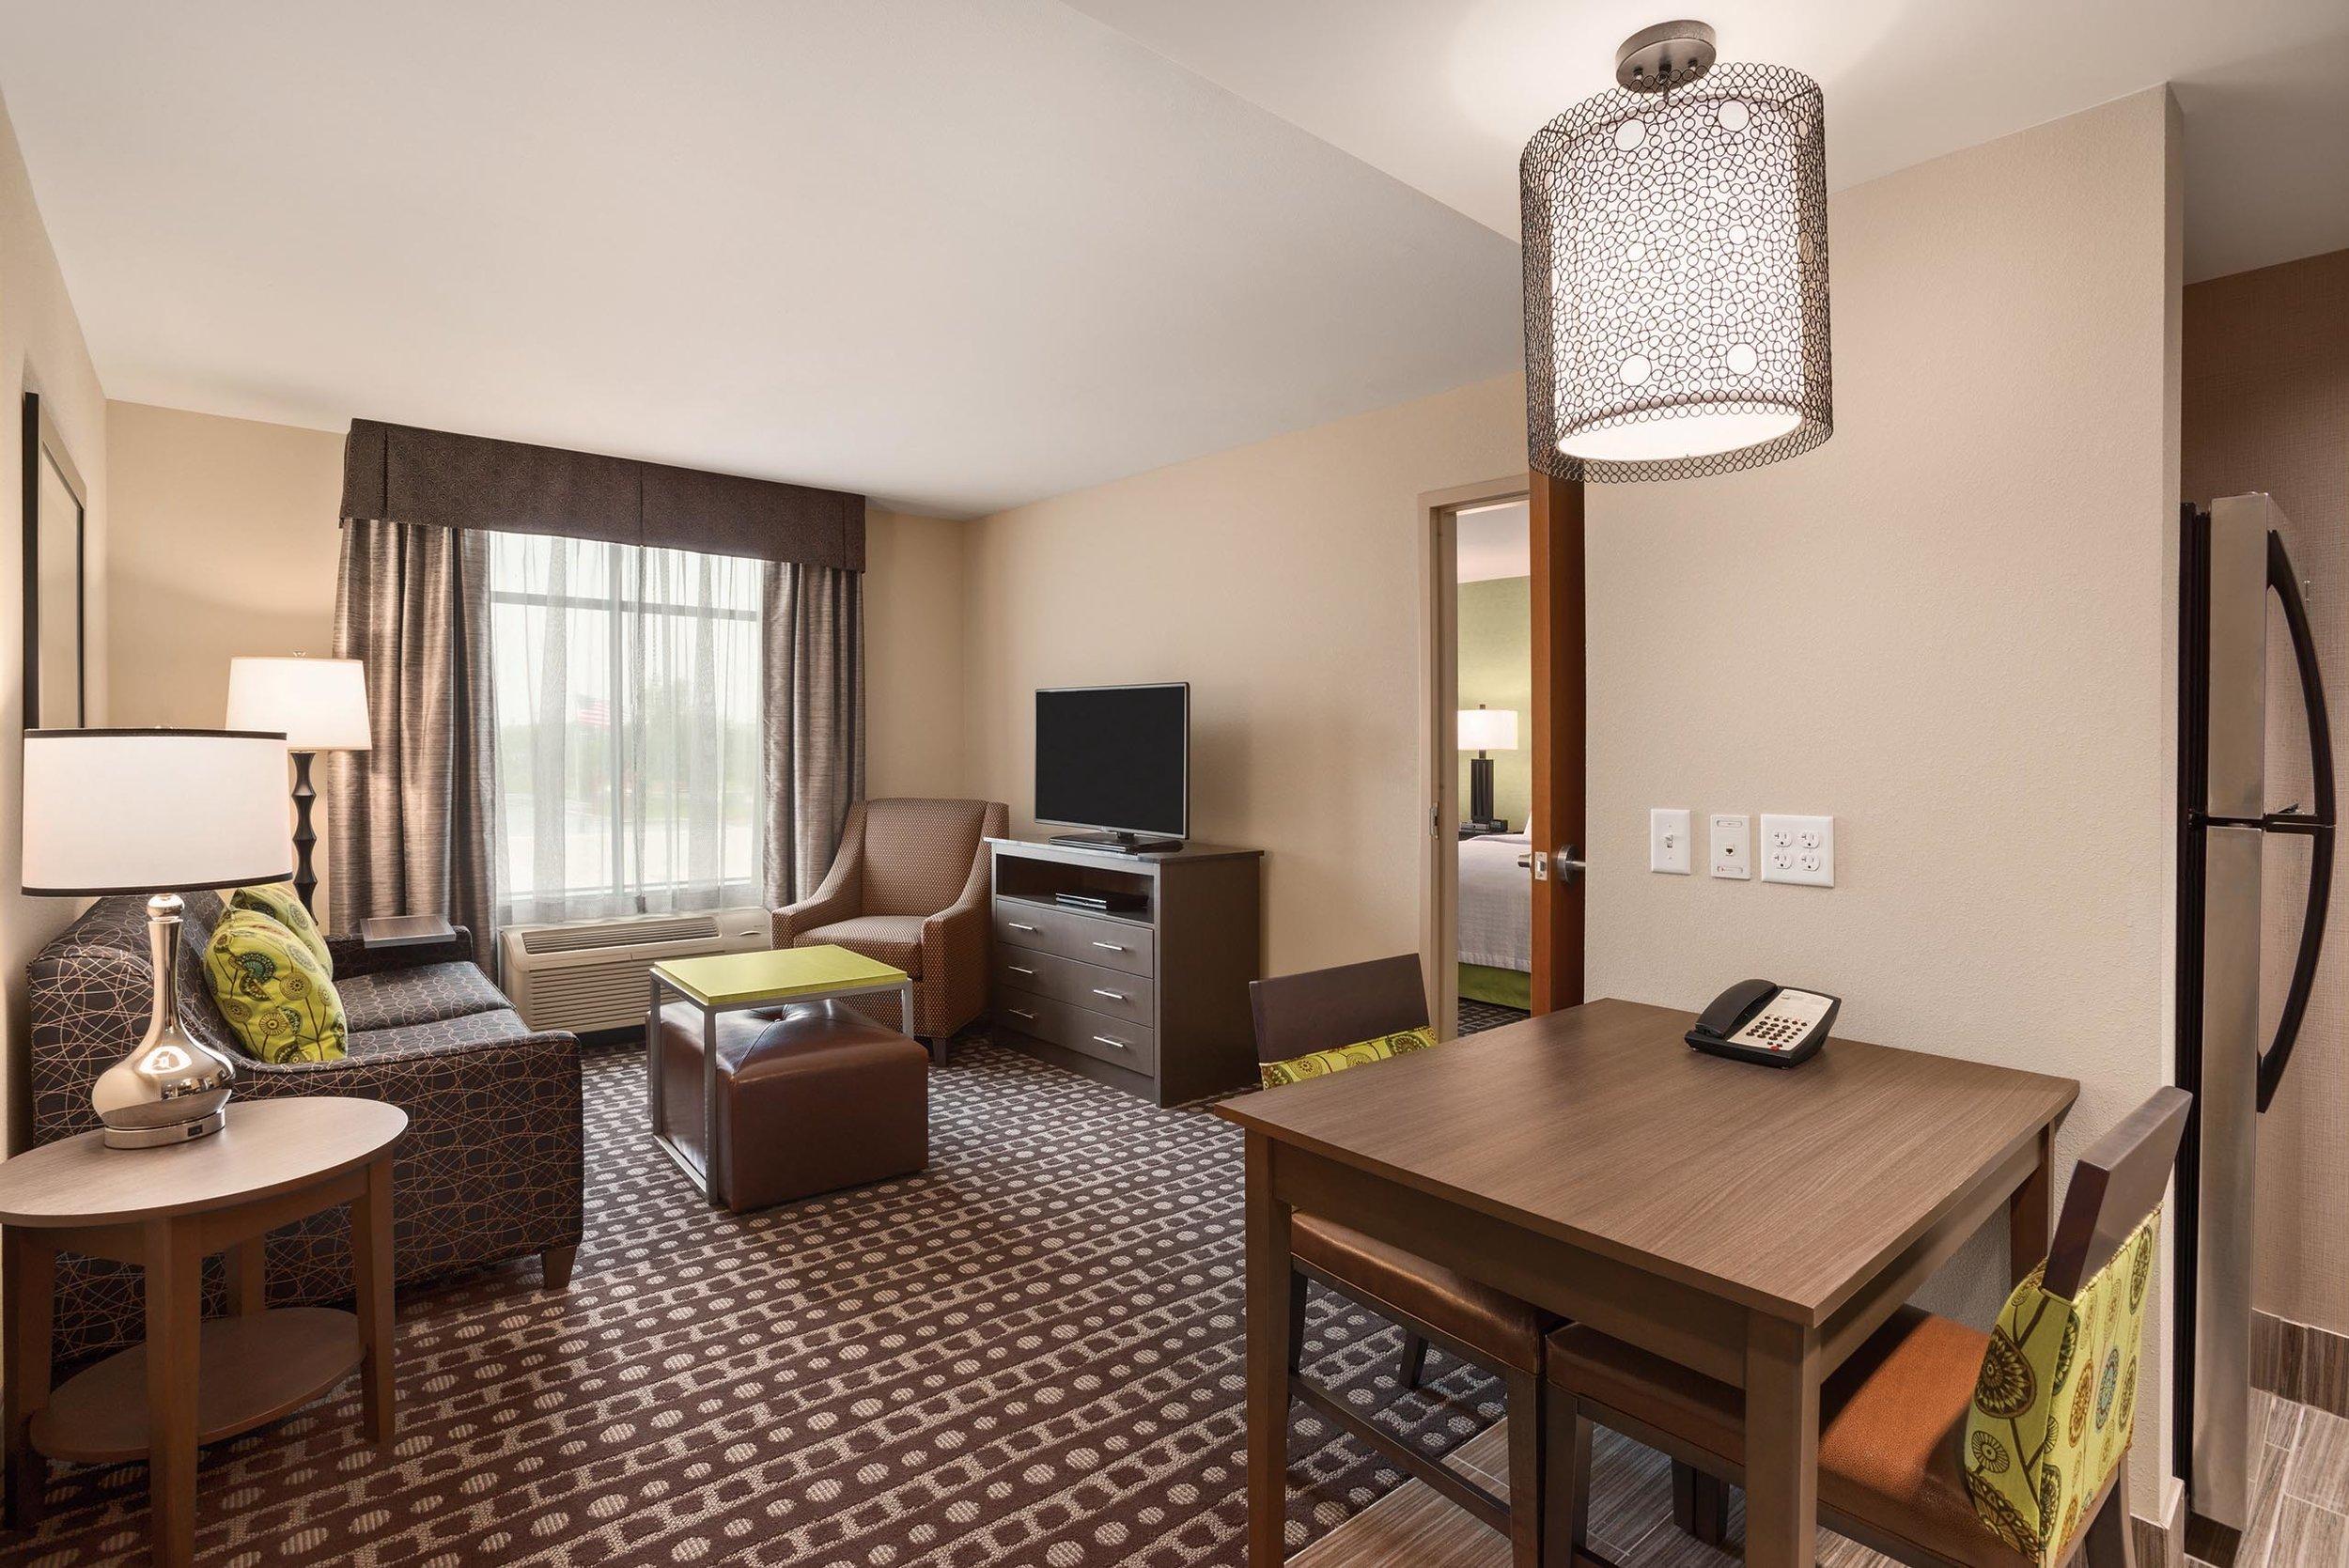 Bedroom living room area in the Homewood Suites in Ankeny, IA